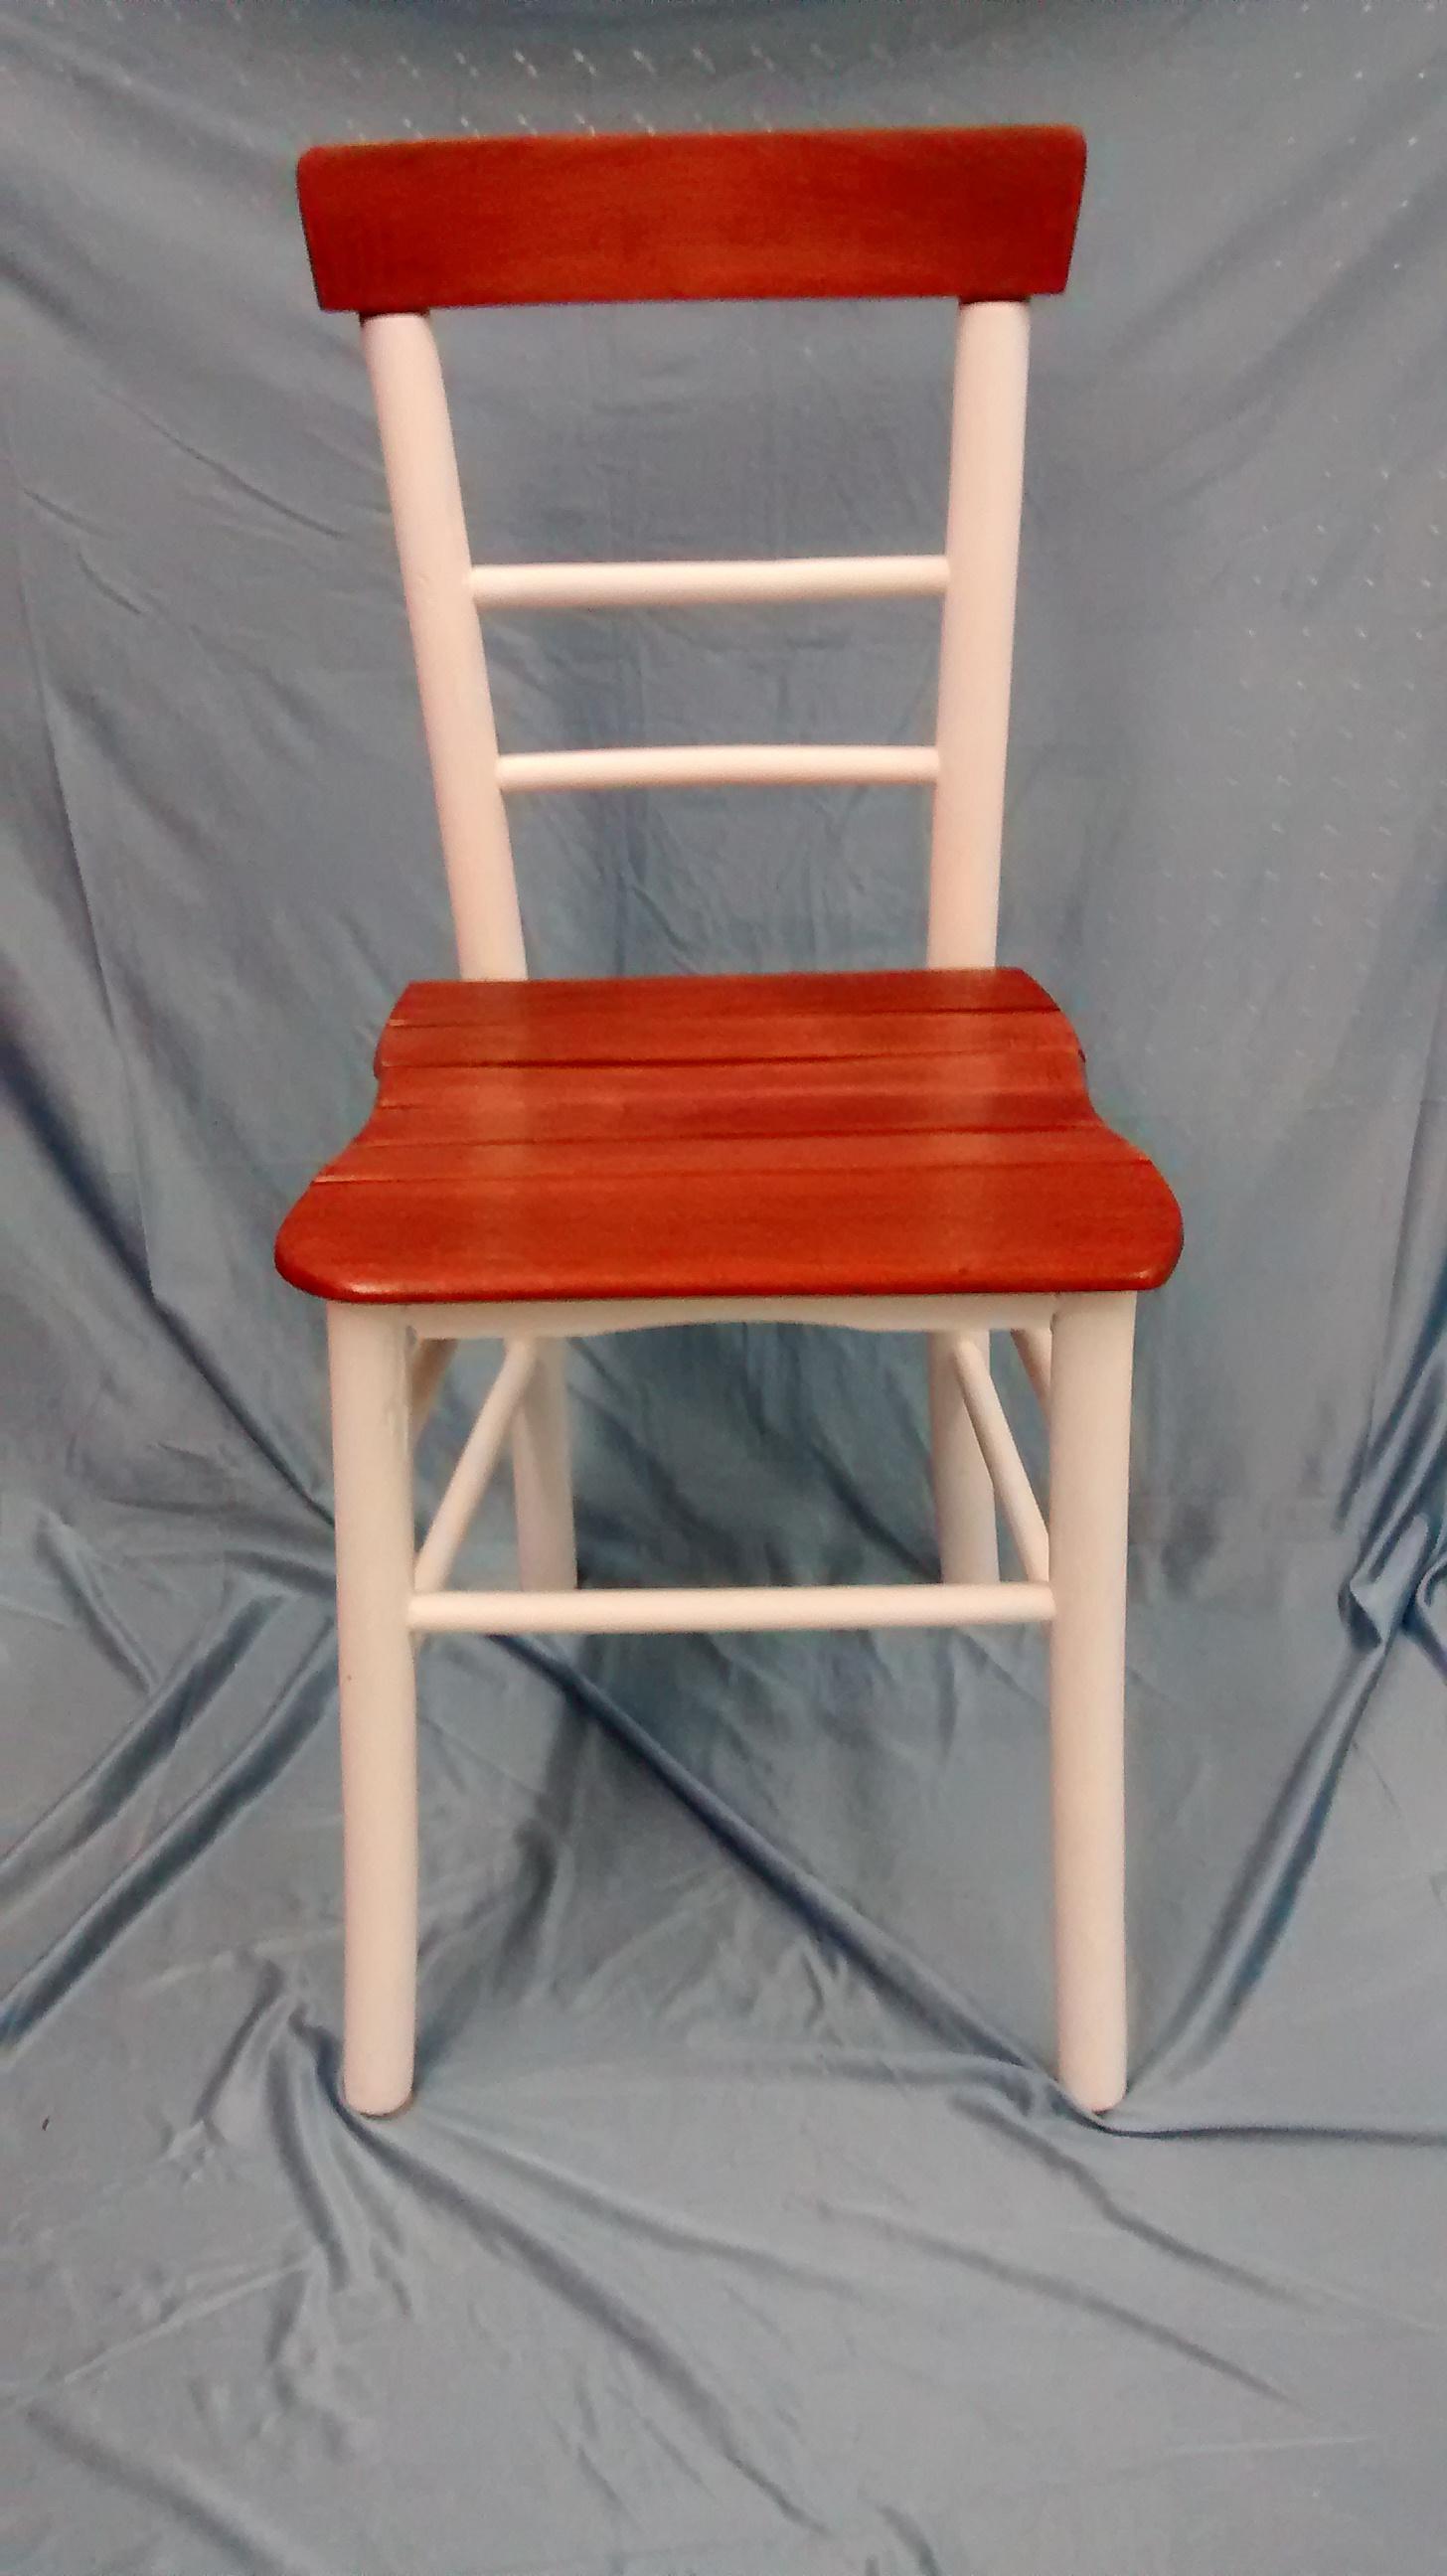 Restored Antique Handmade Wooden Chair